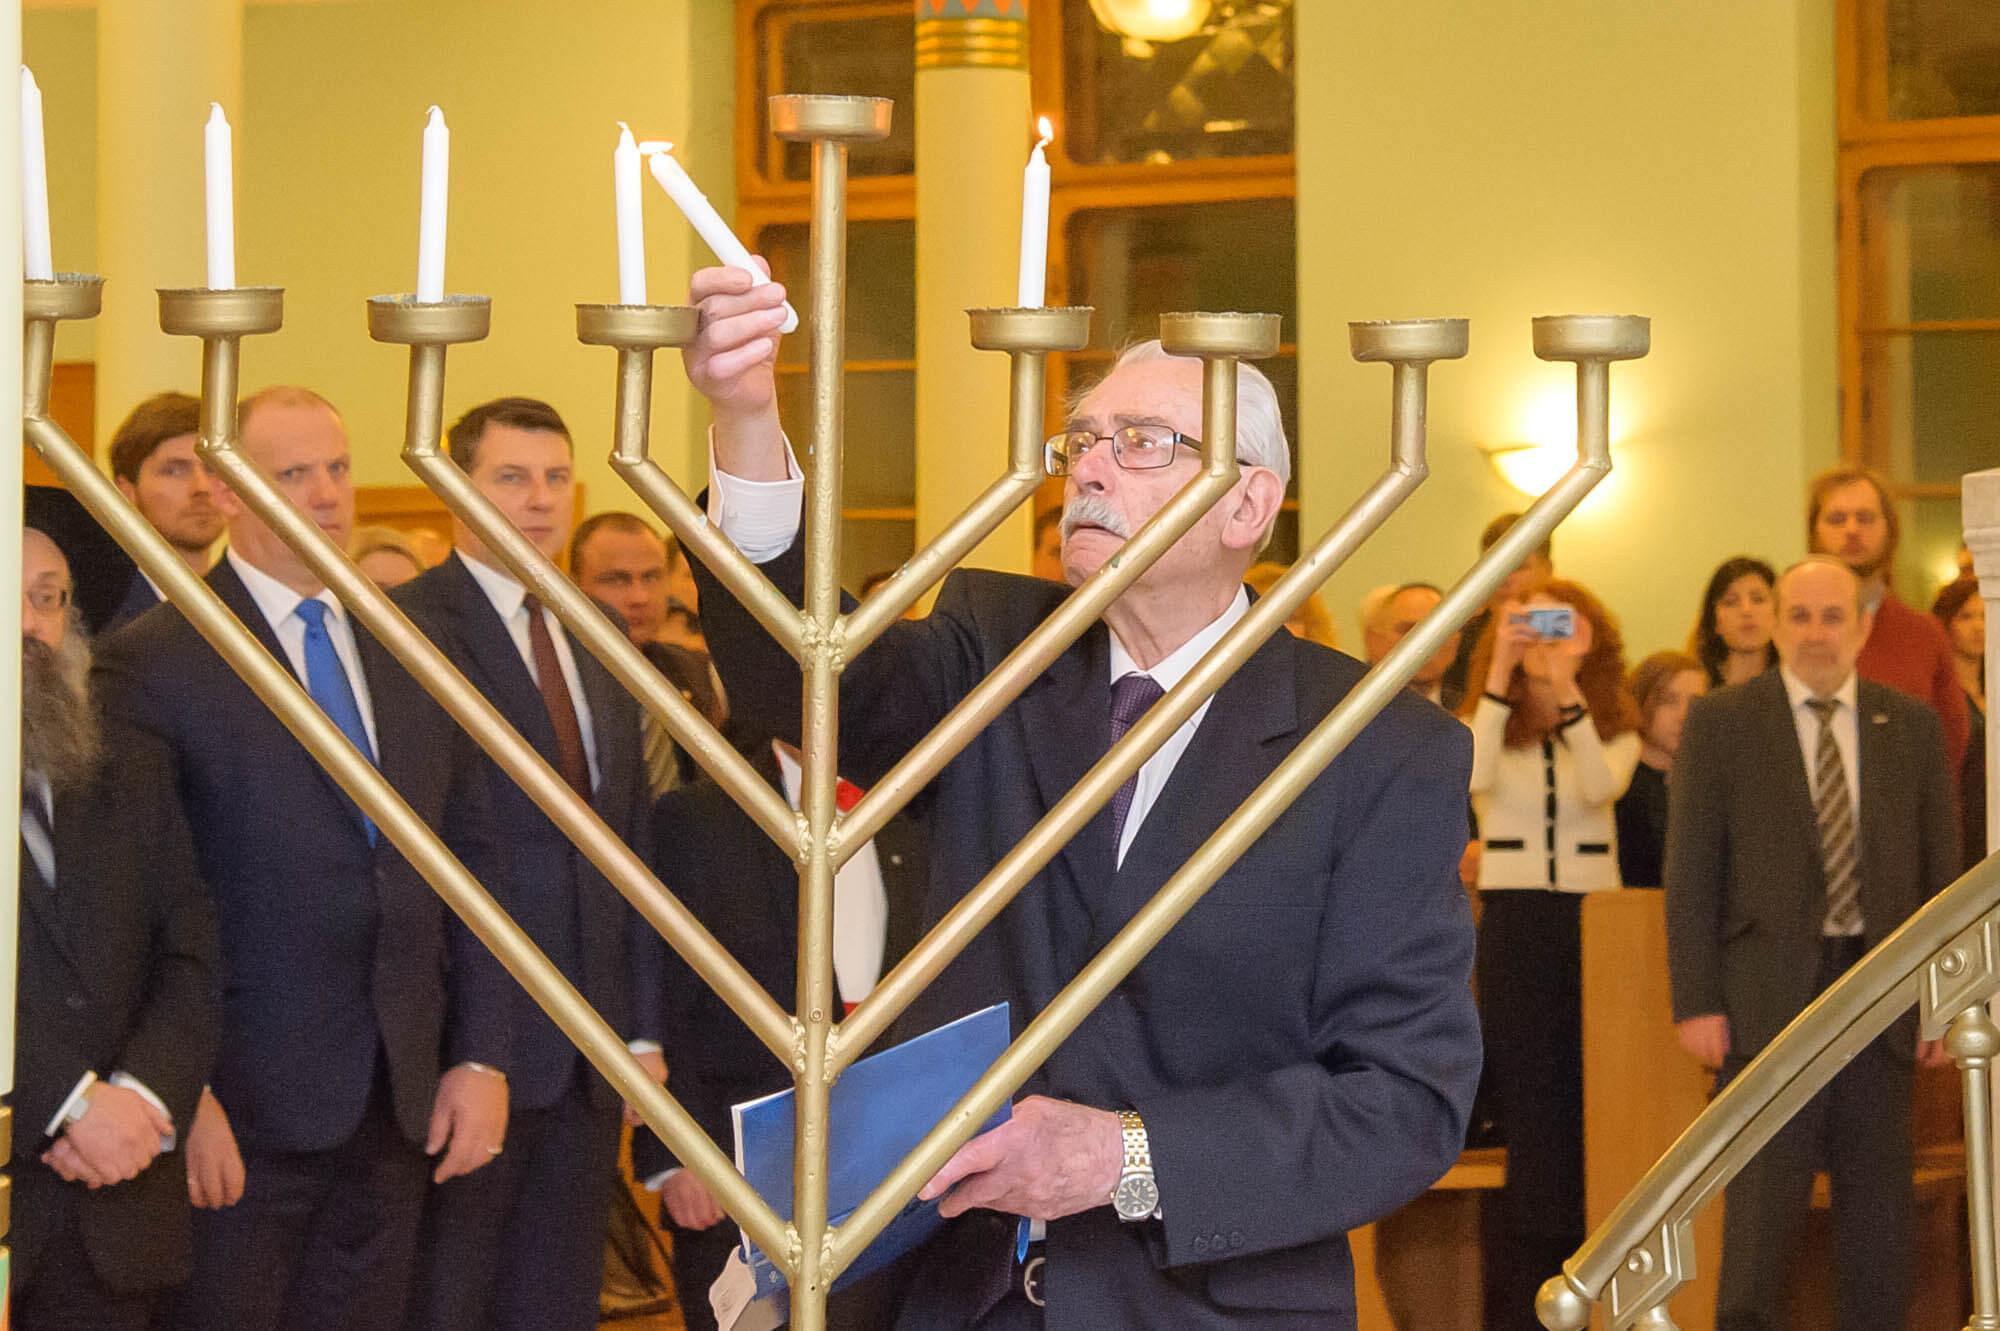 President of Latvia has lit Hanukkah candles